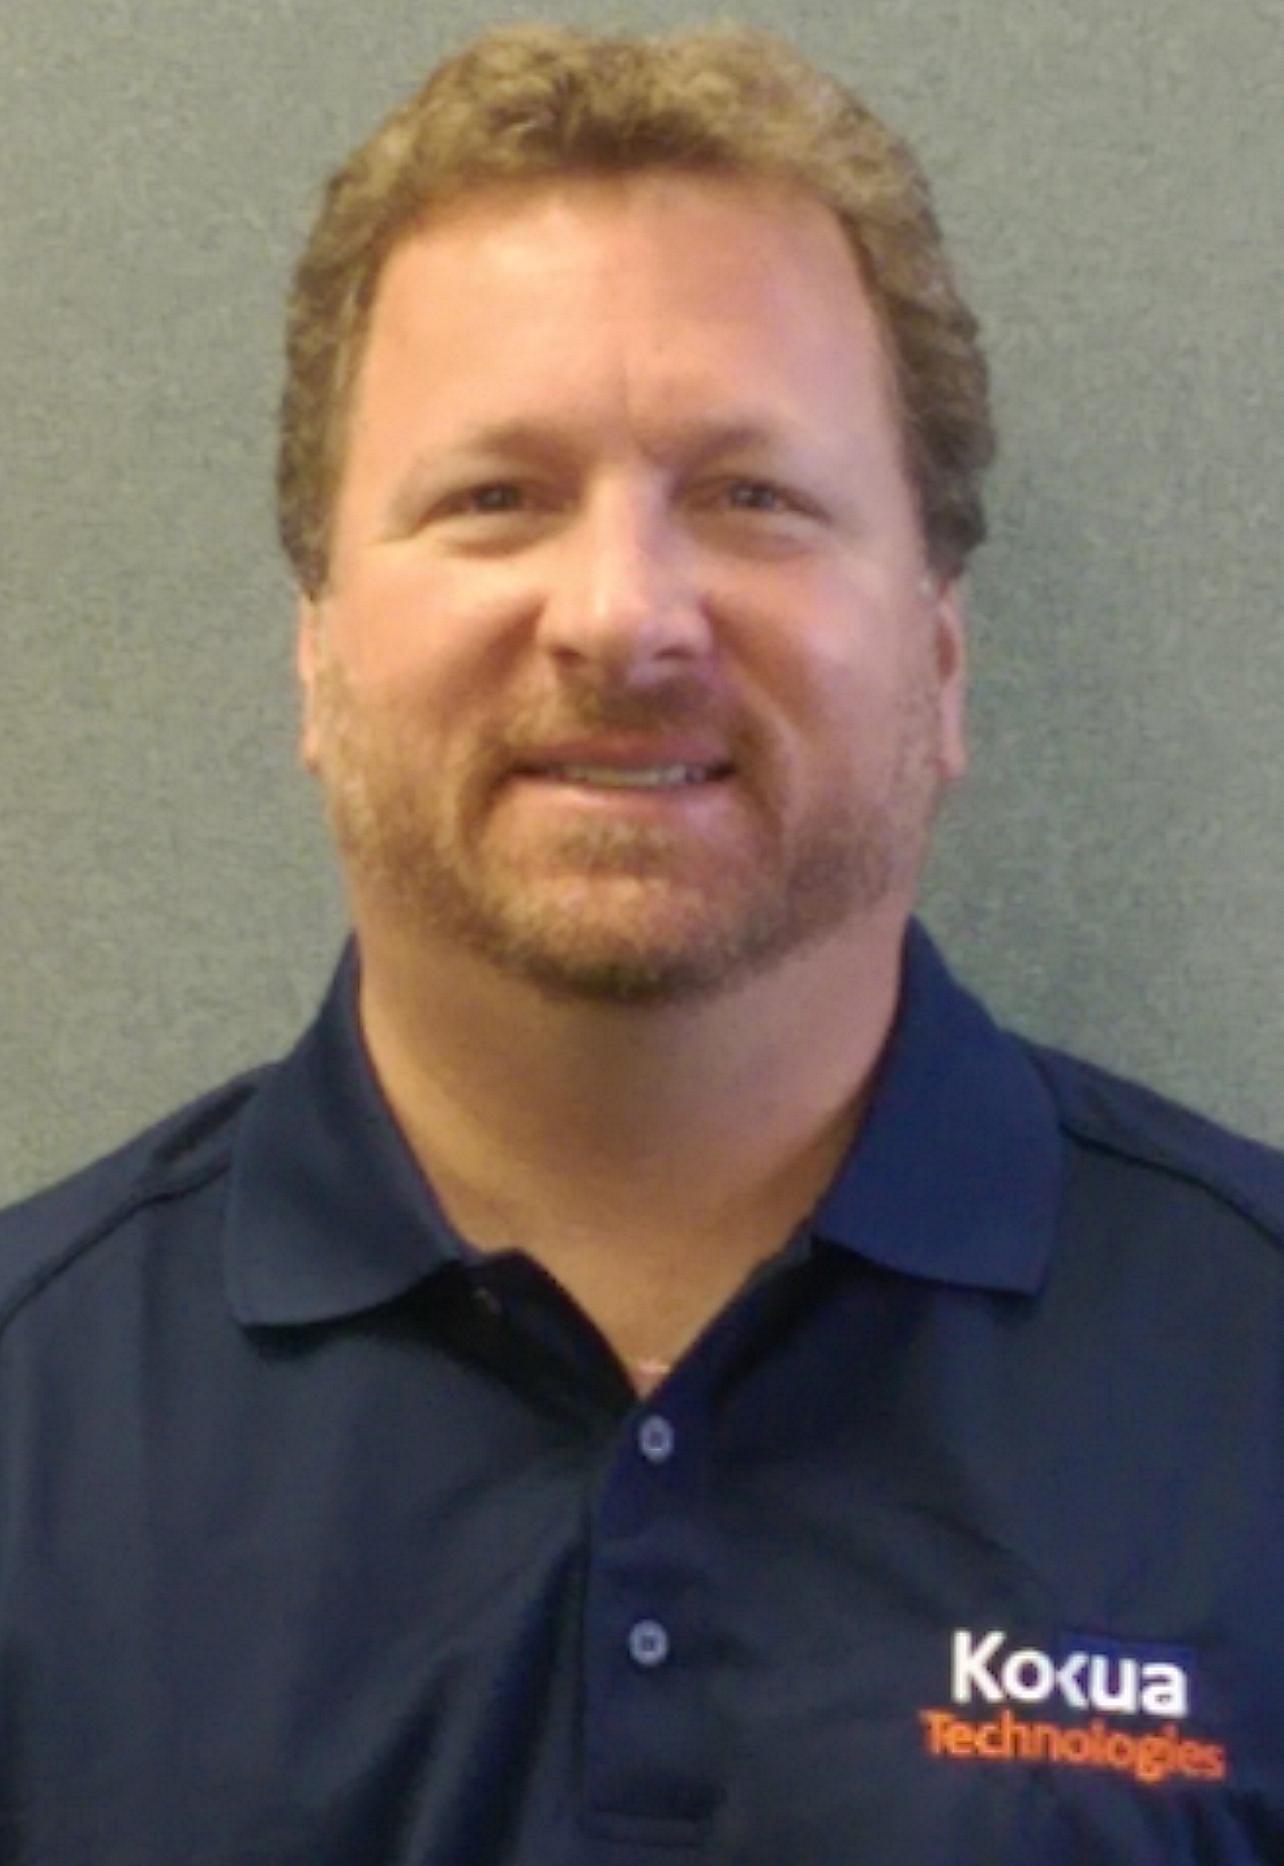 Jeff Platt, CEO - Kokua Technologies, Mount Laurel, NJ